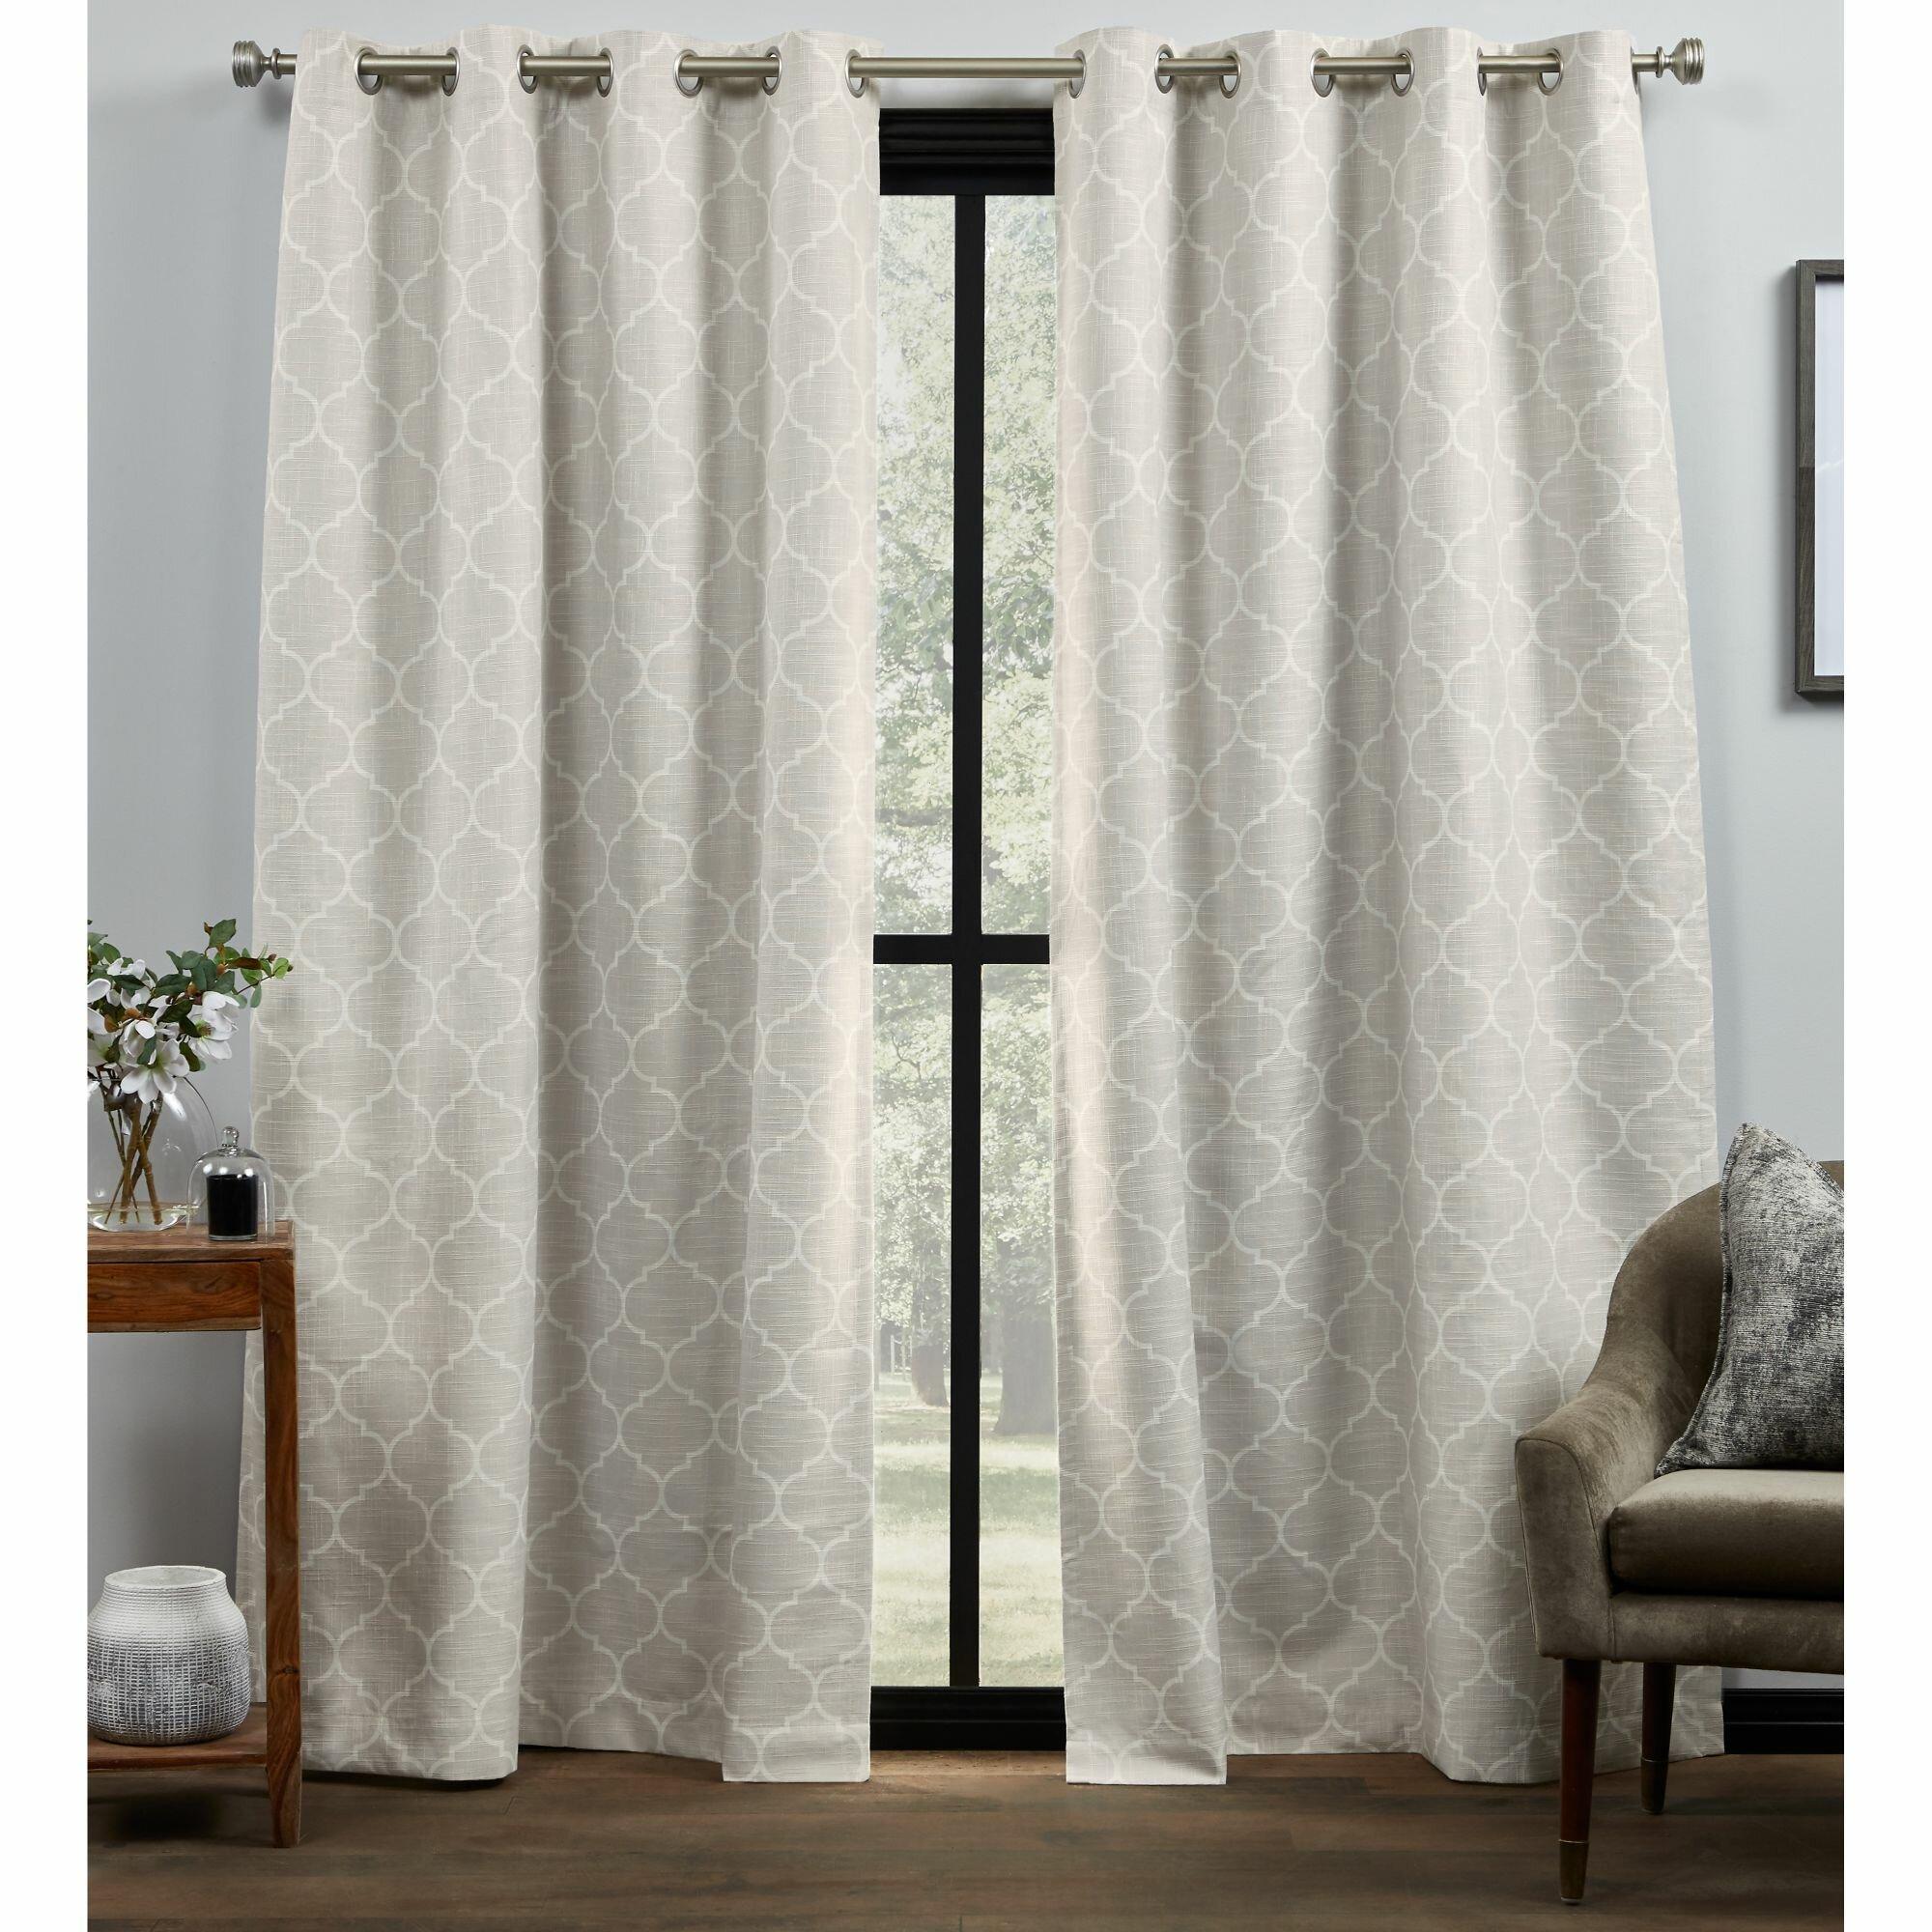 Red Barrel Studio Palni Trellis Blackout Thermal Grommet Curtain Panels Reviews Wayfair